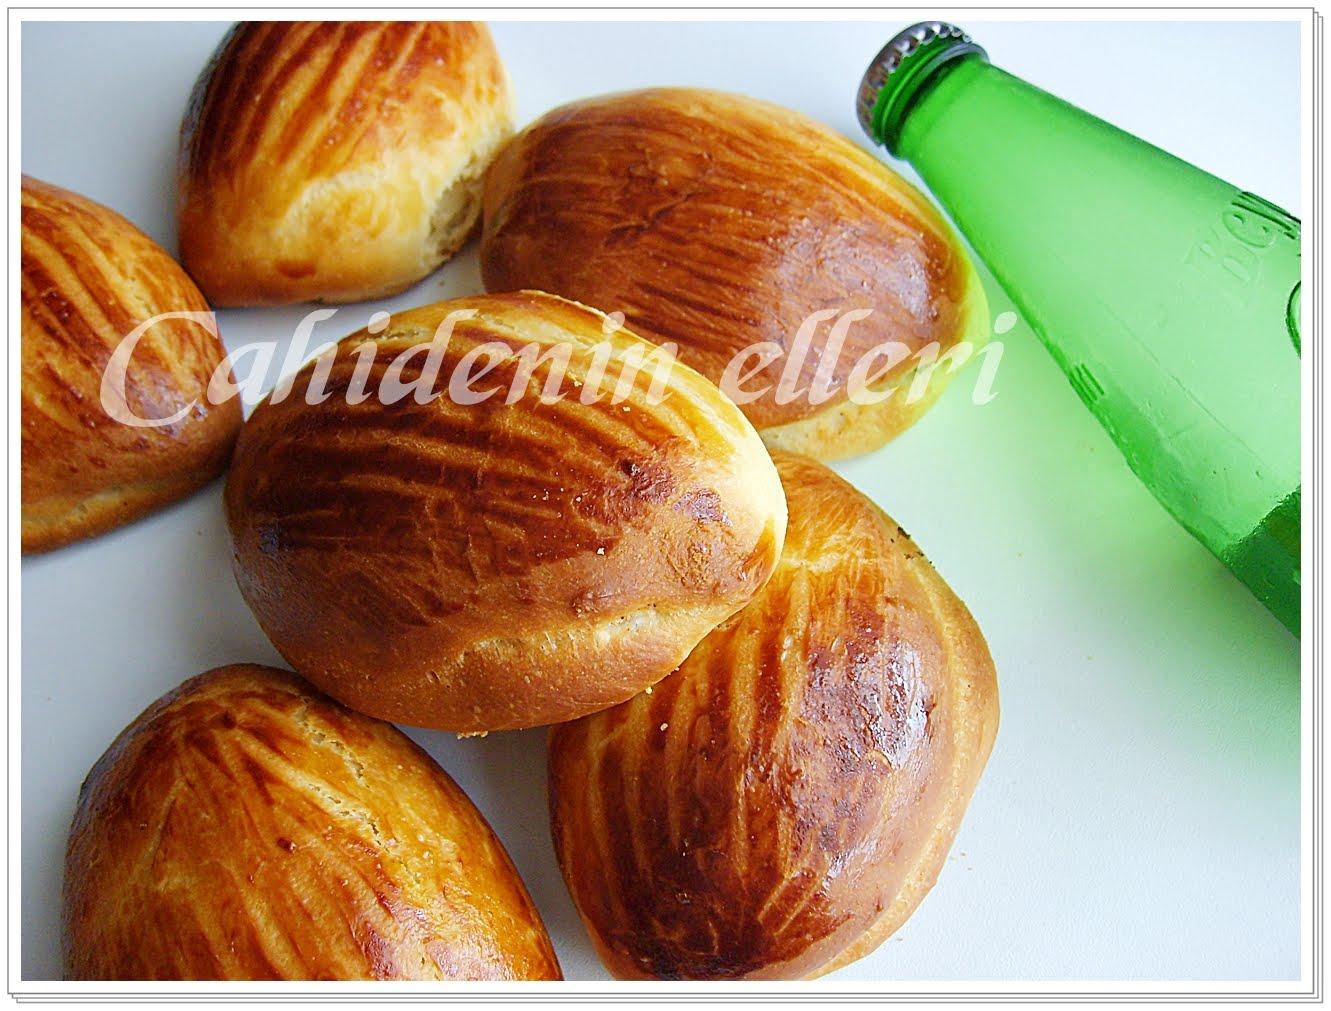 Patatesli Çabuk Poğaça Tarifi